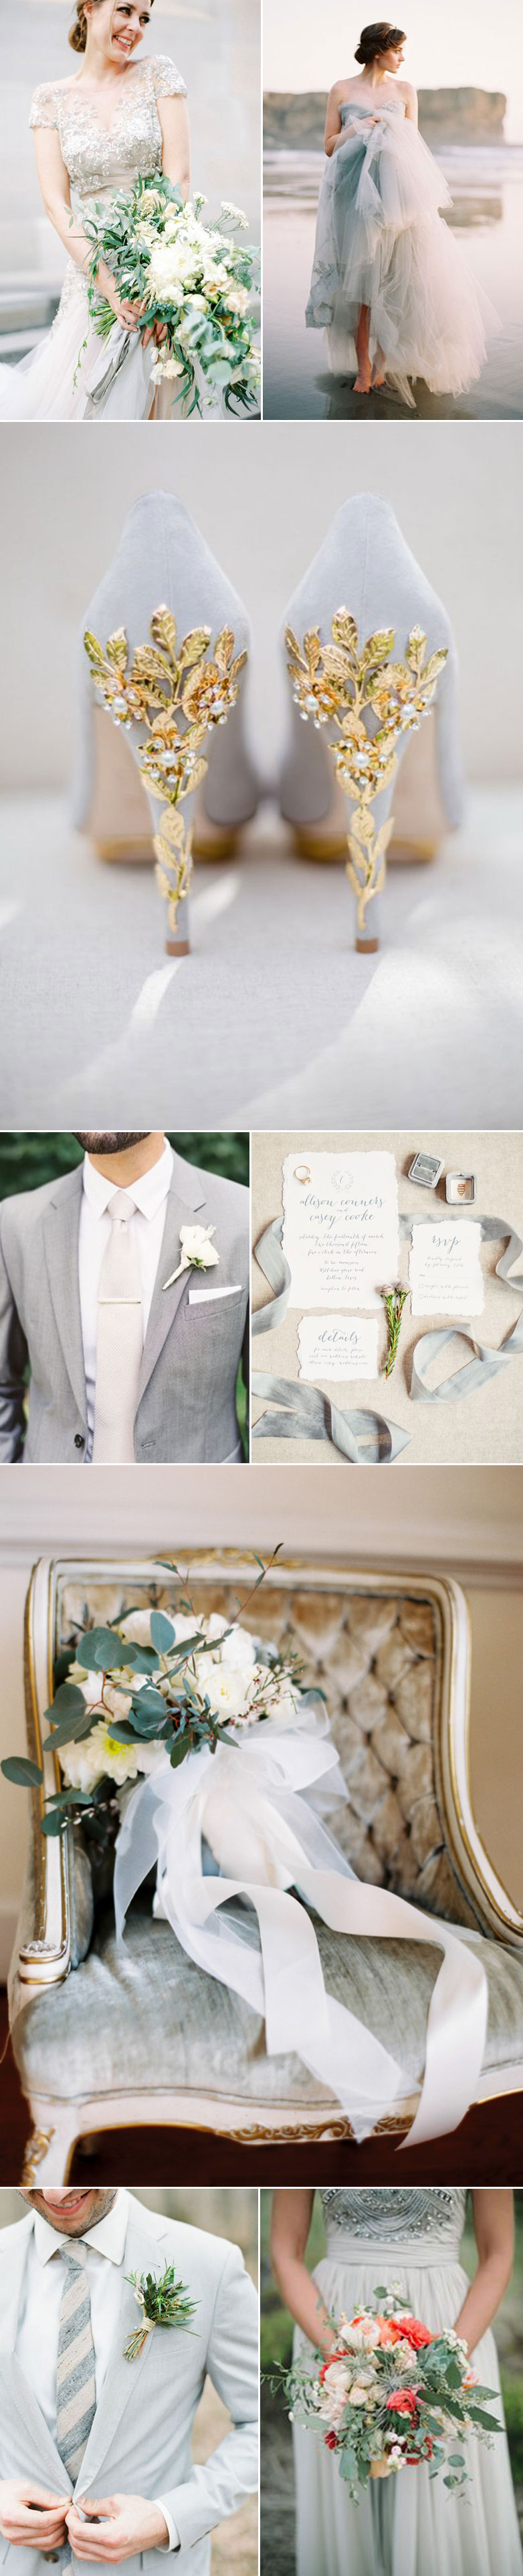 Wedding Inspiration For Dove Gray